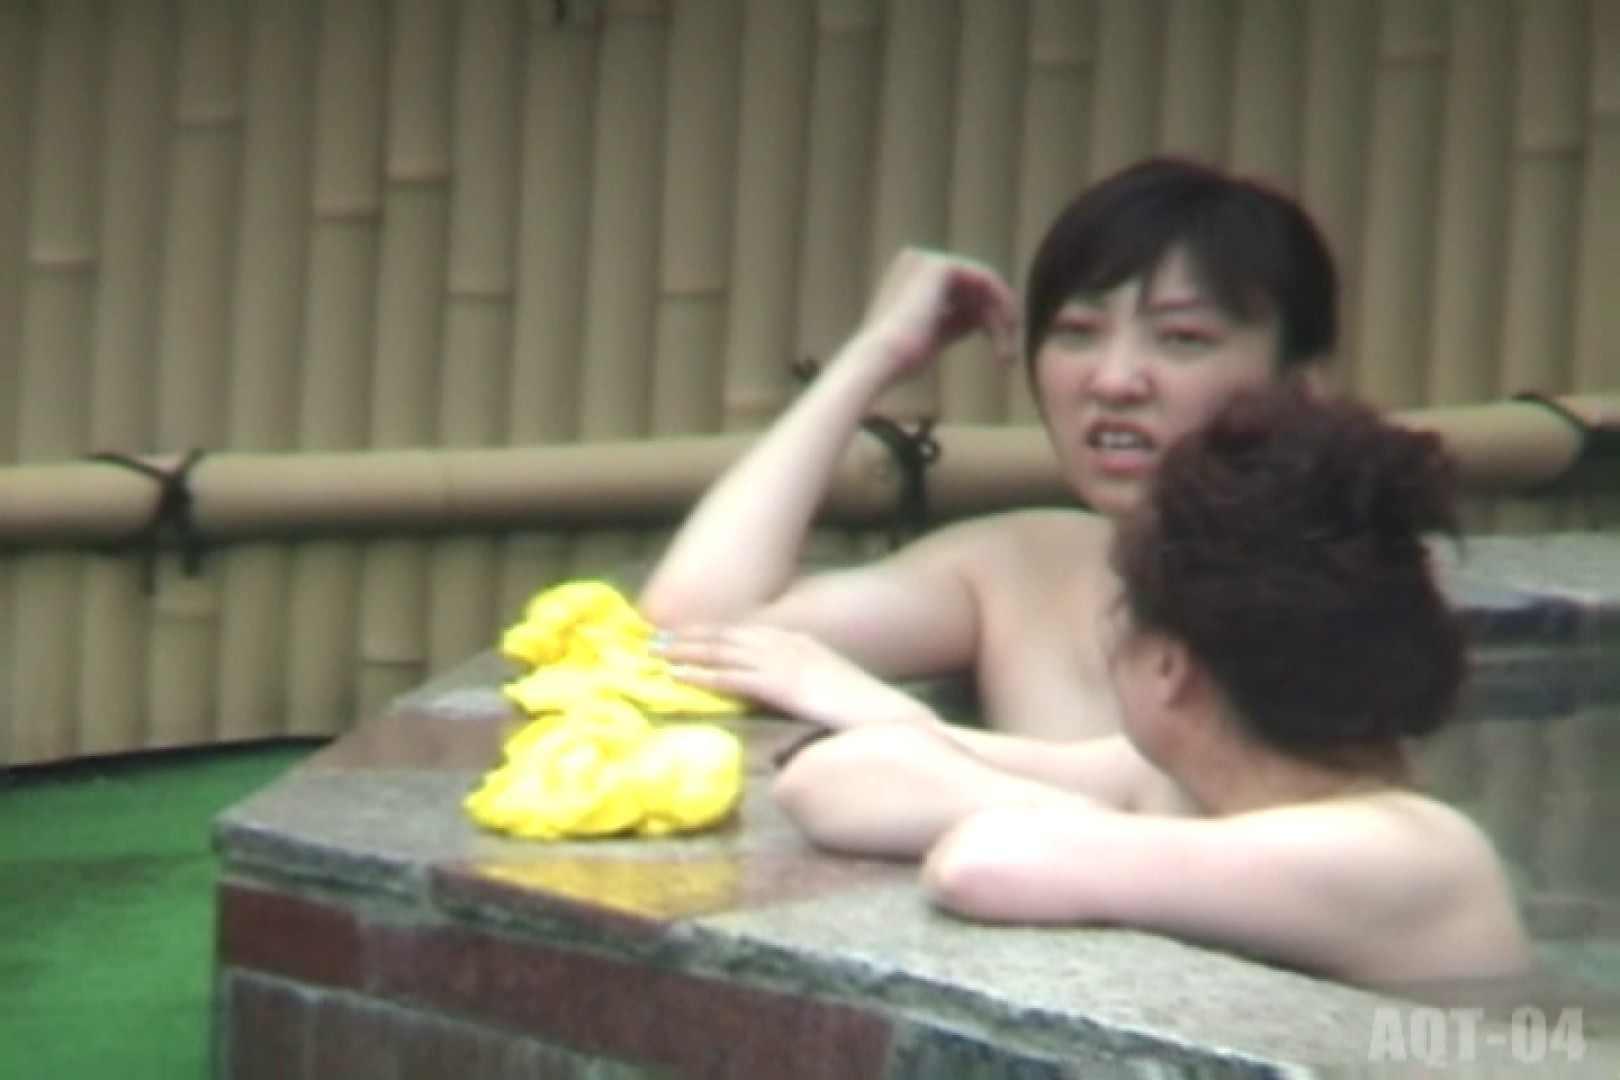 Aquaな露天風呂Vol.743 盗撮映像  75Pix 38